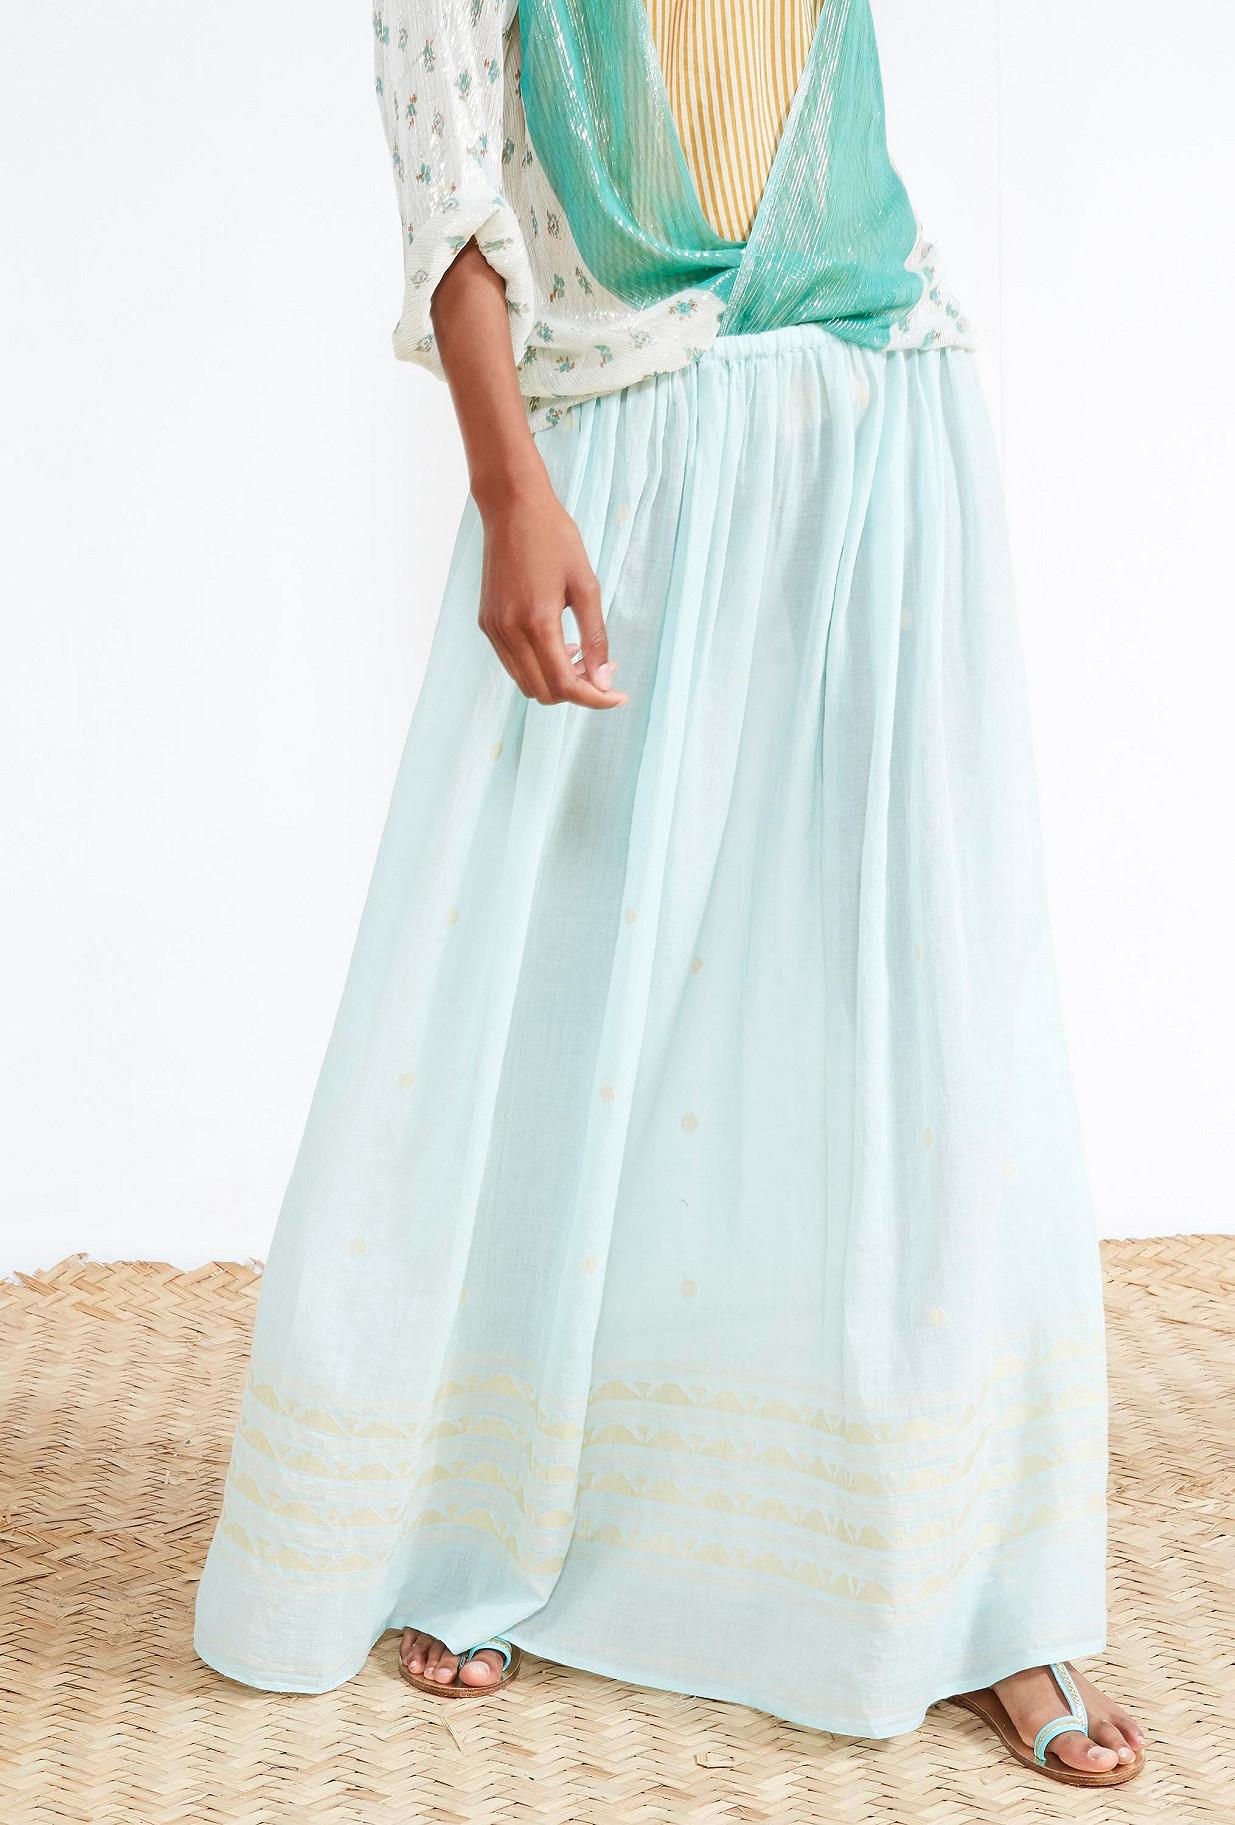 JUPE Aqua  Tahiti mes demoiselles paris vêtement femme paris